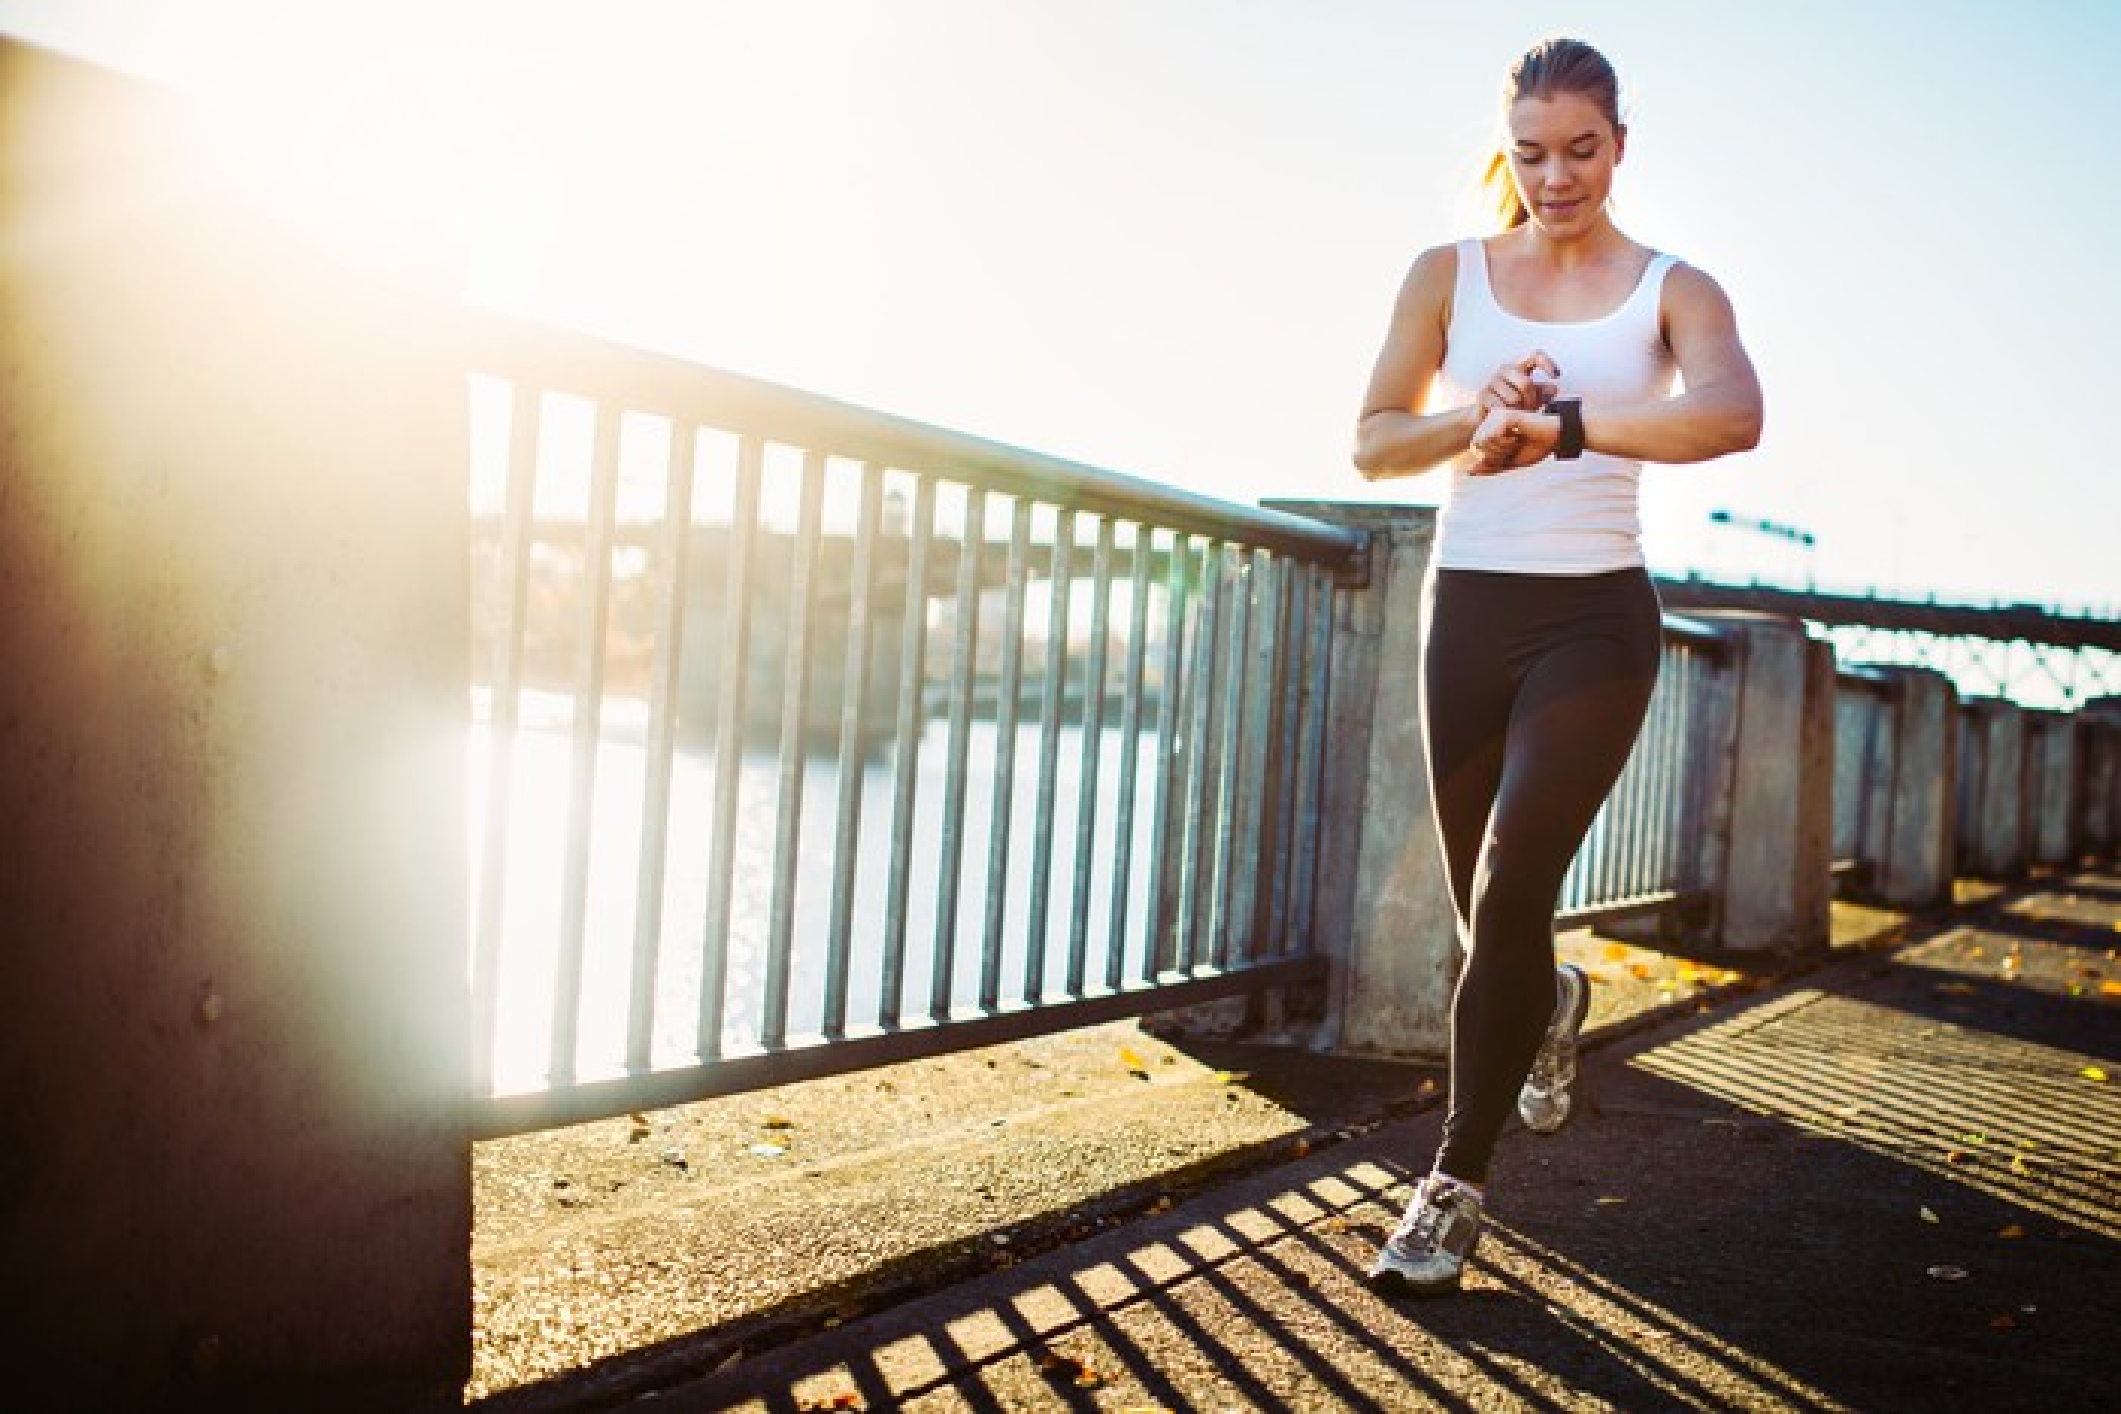 A woman jogging alongside a river checks her smartwatch.